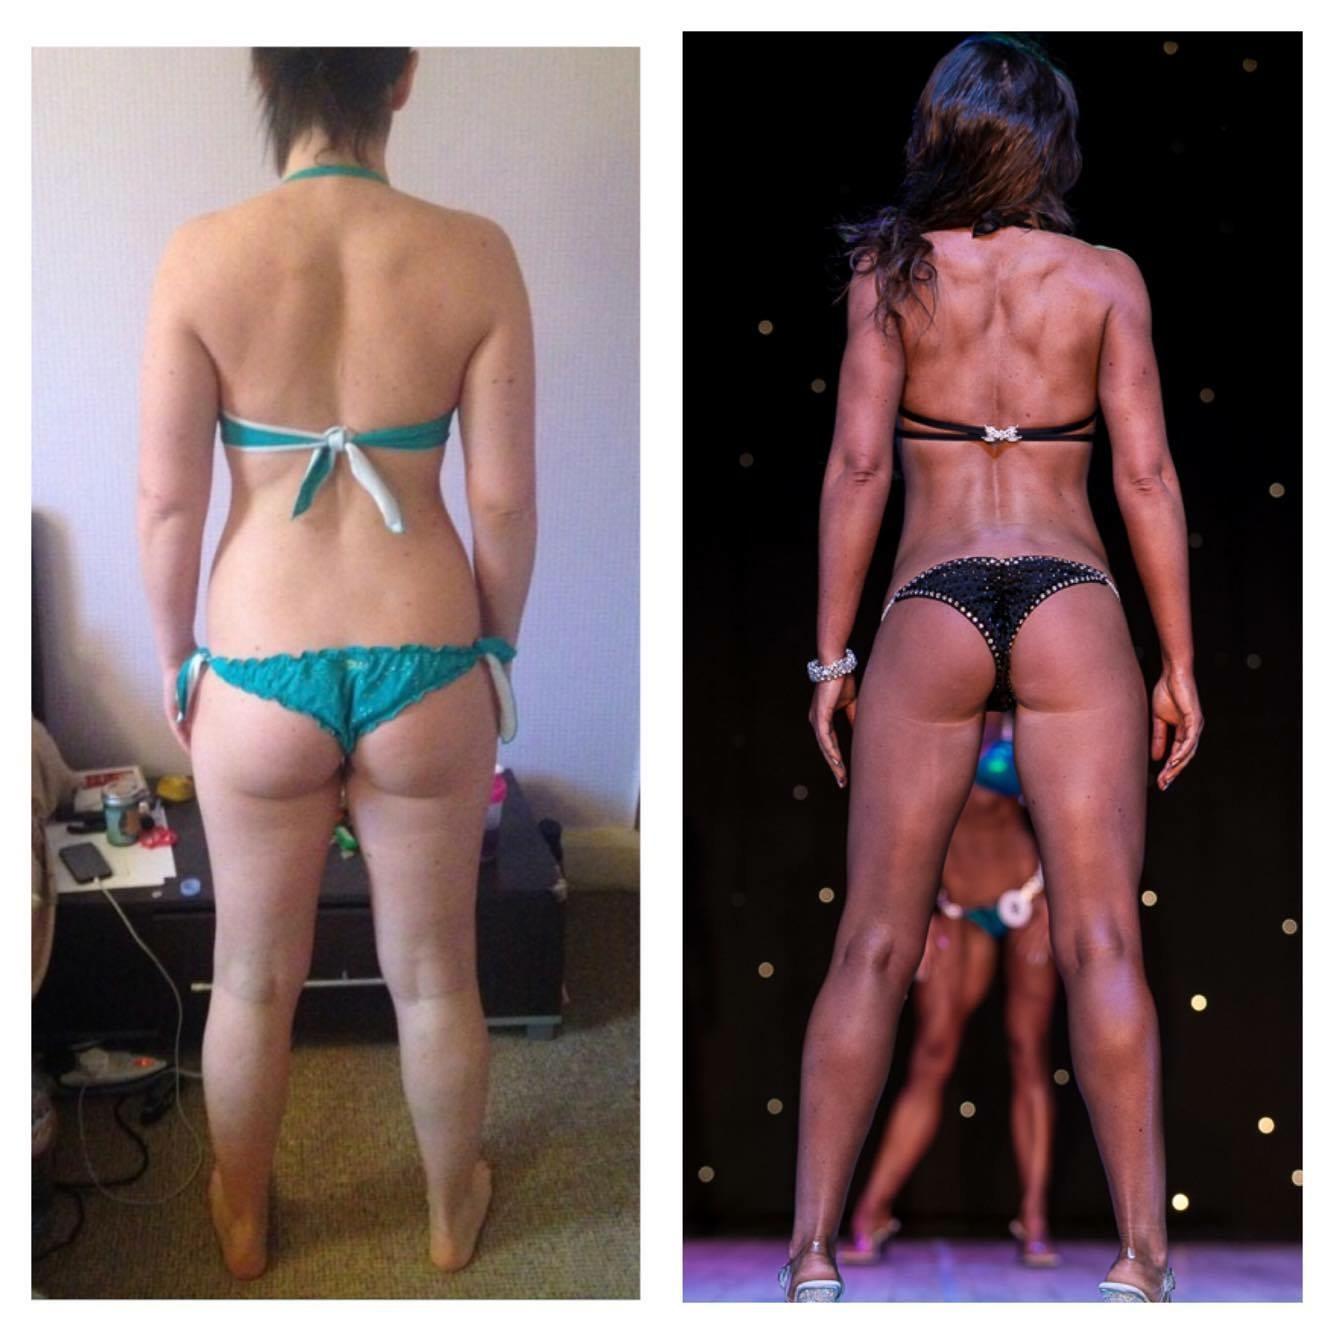 Bikini Body Transformation